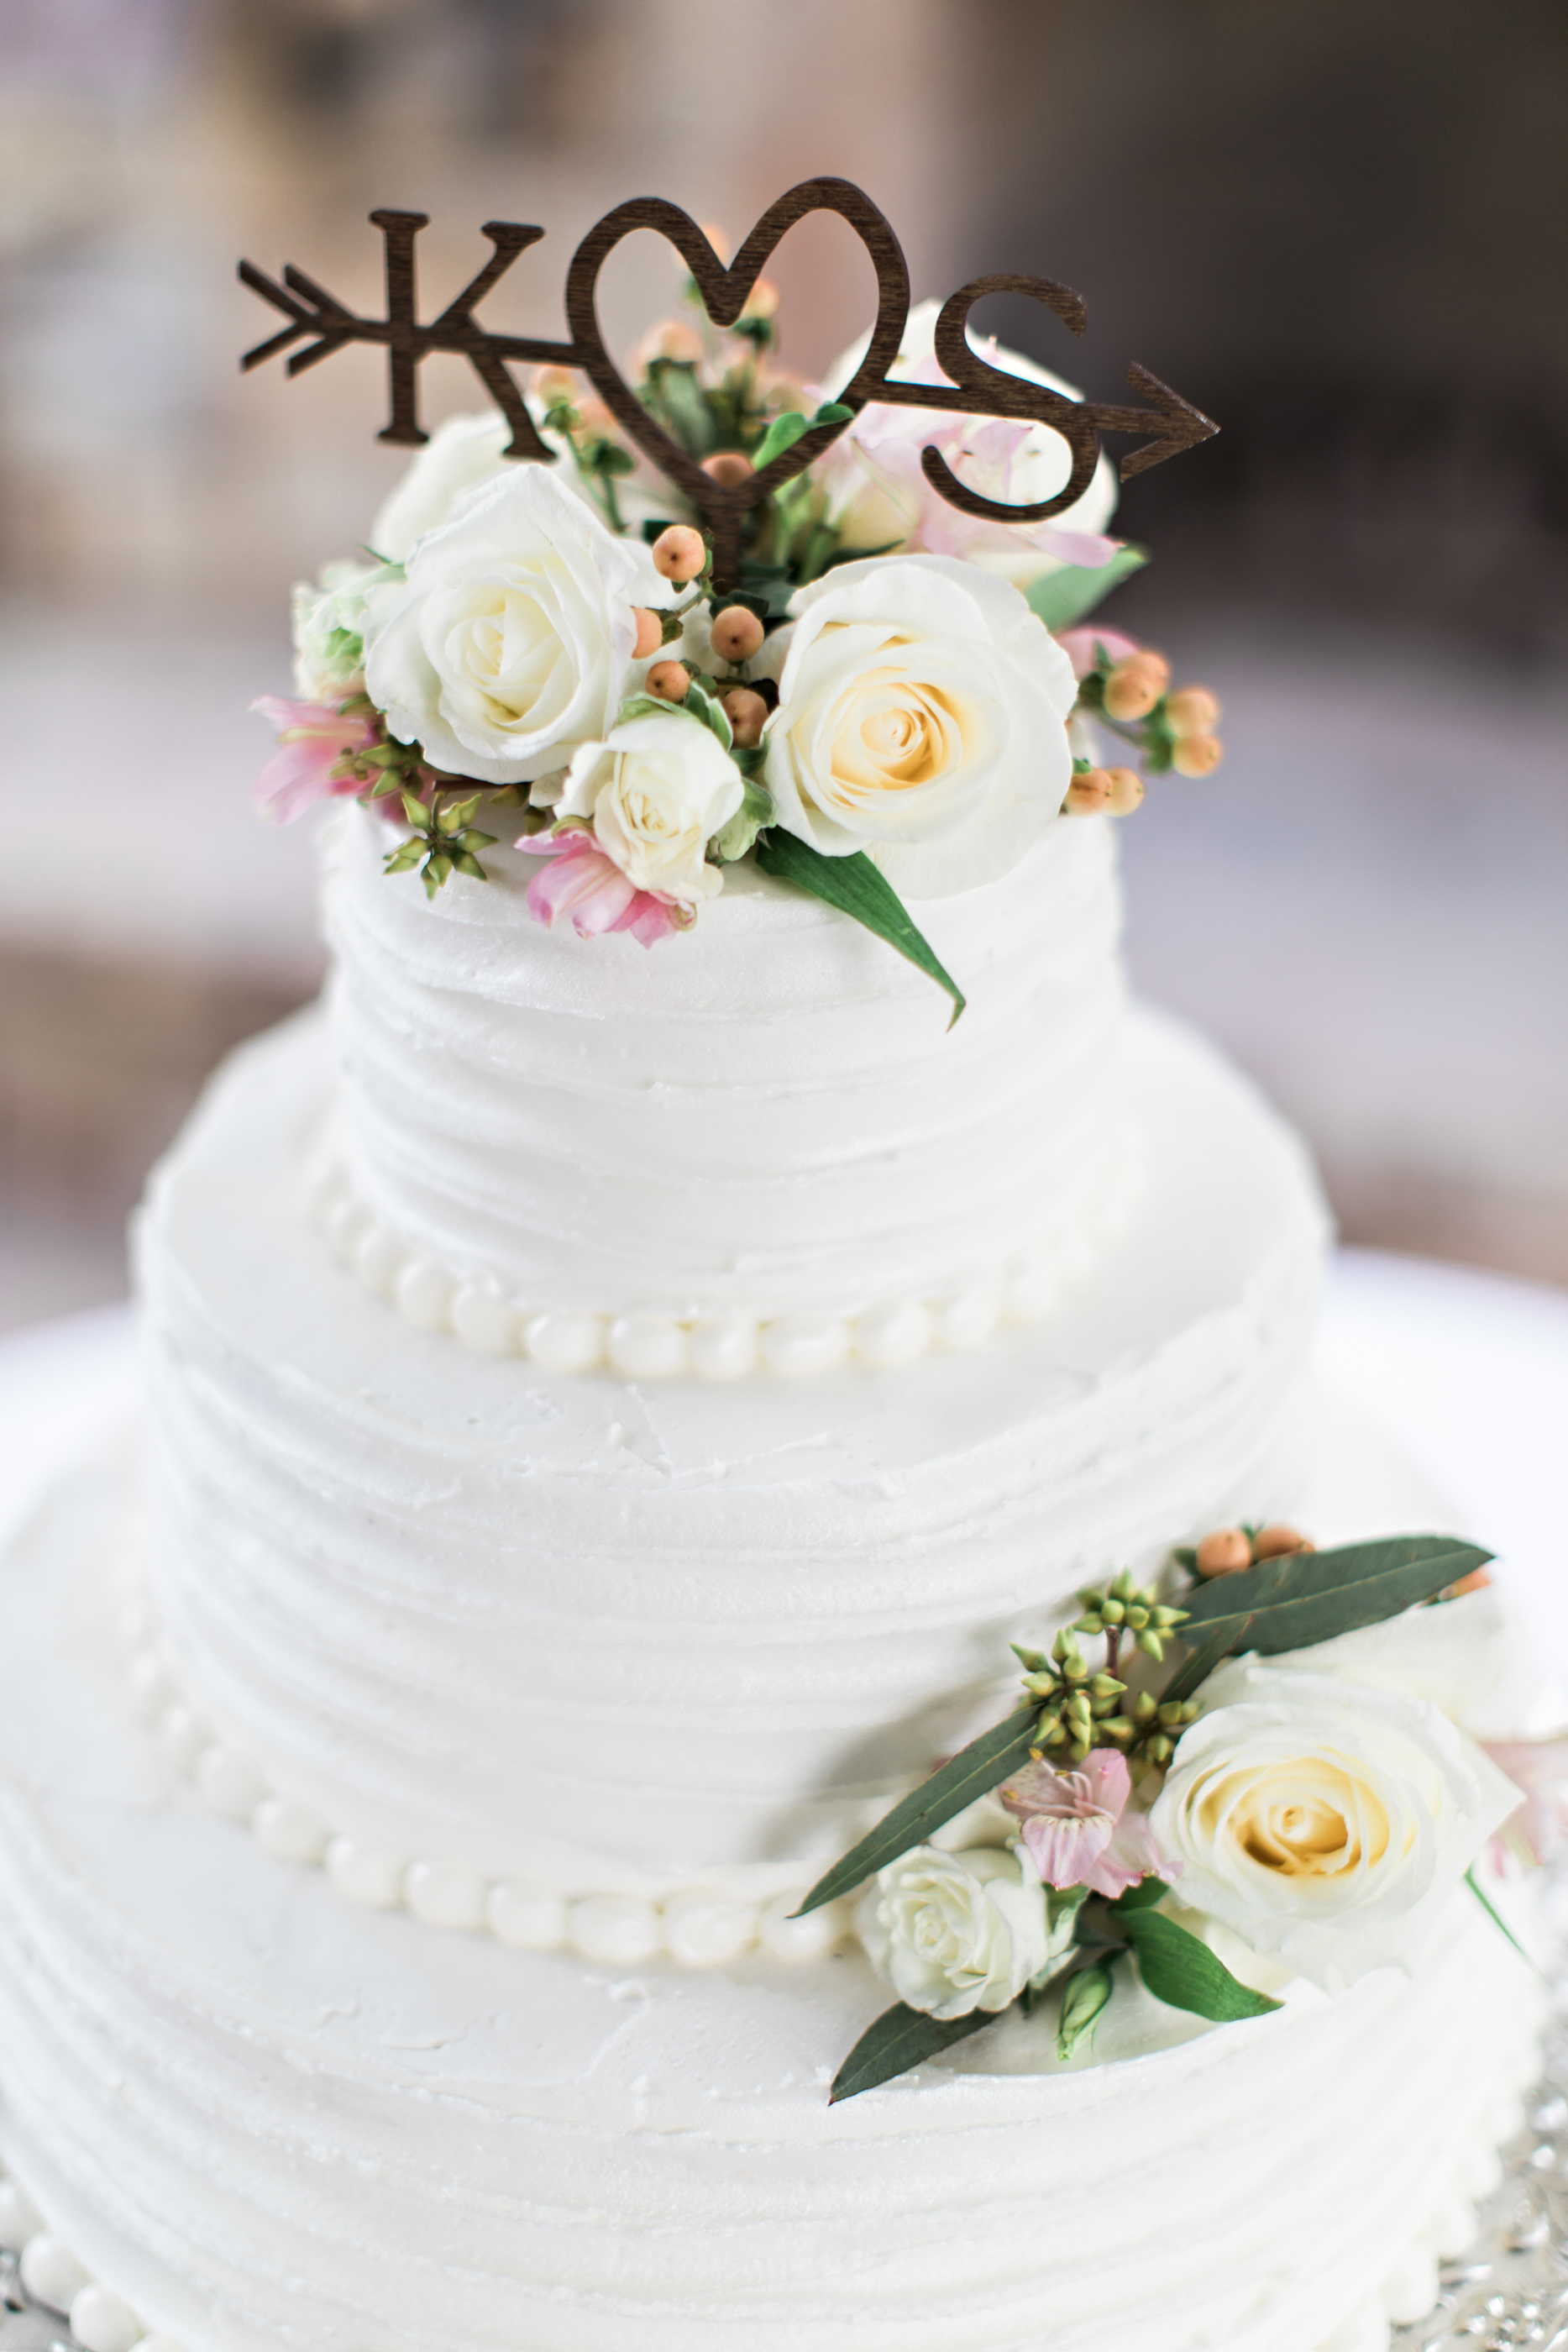 Ni ck-Drollette-Photography-Auburn-Alabama-Weddings-Sylvia-Kevin-136.jpg